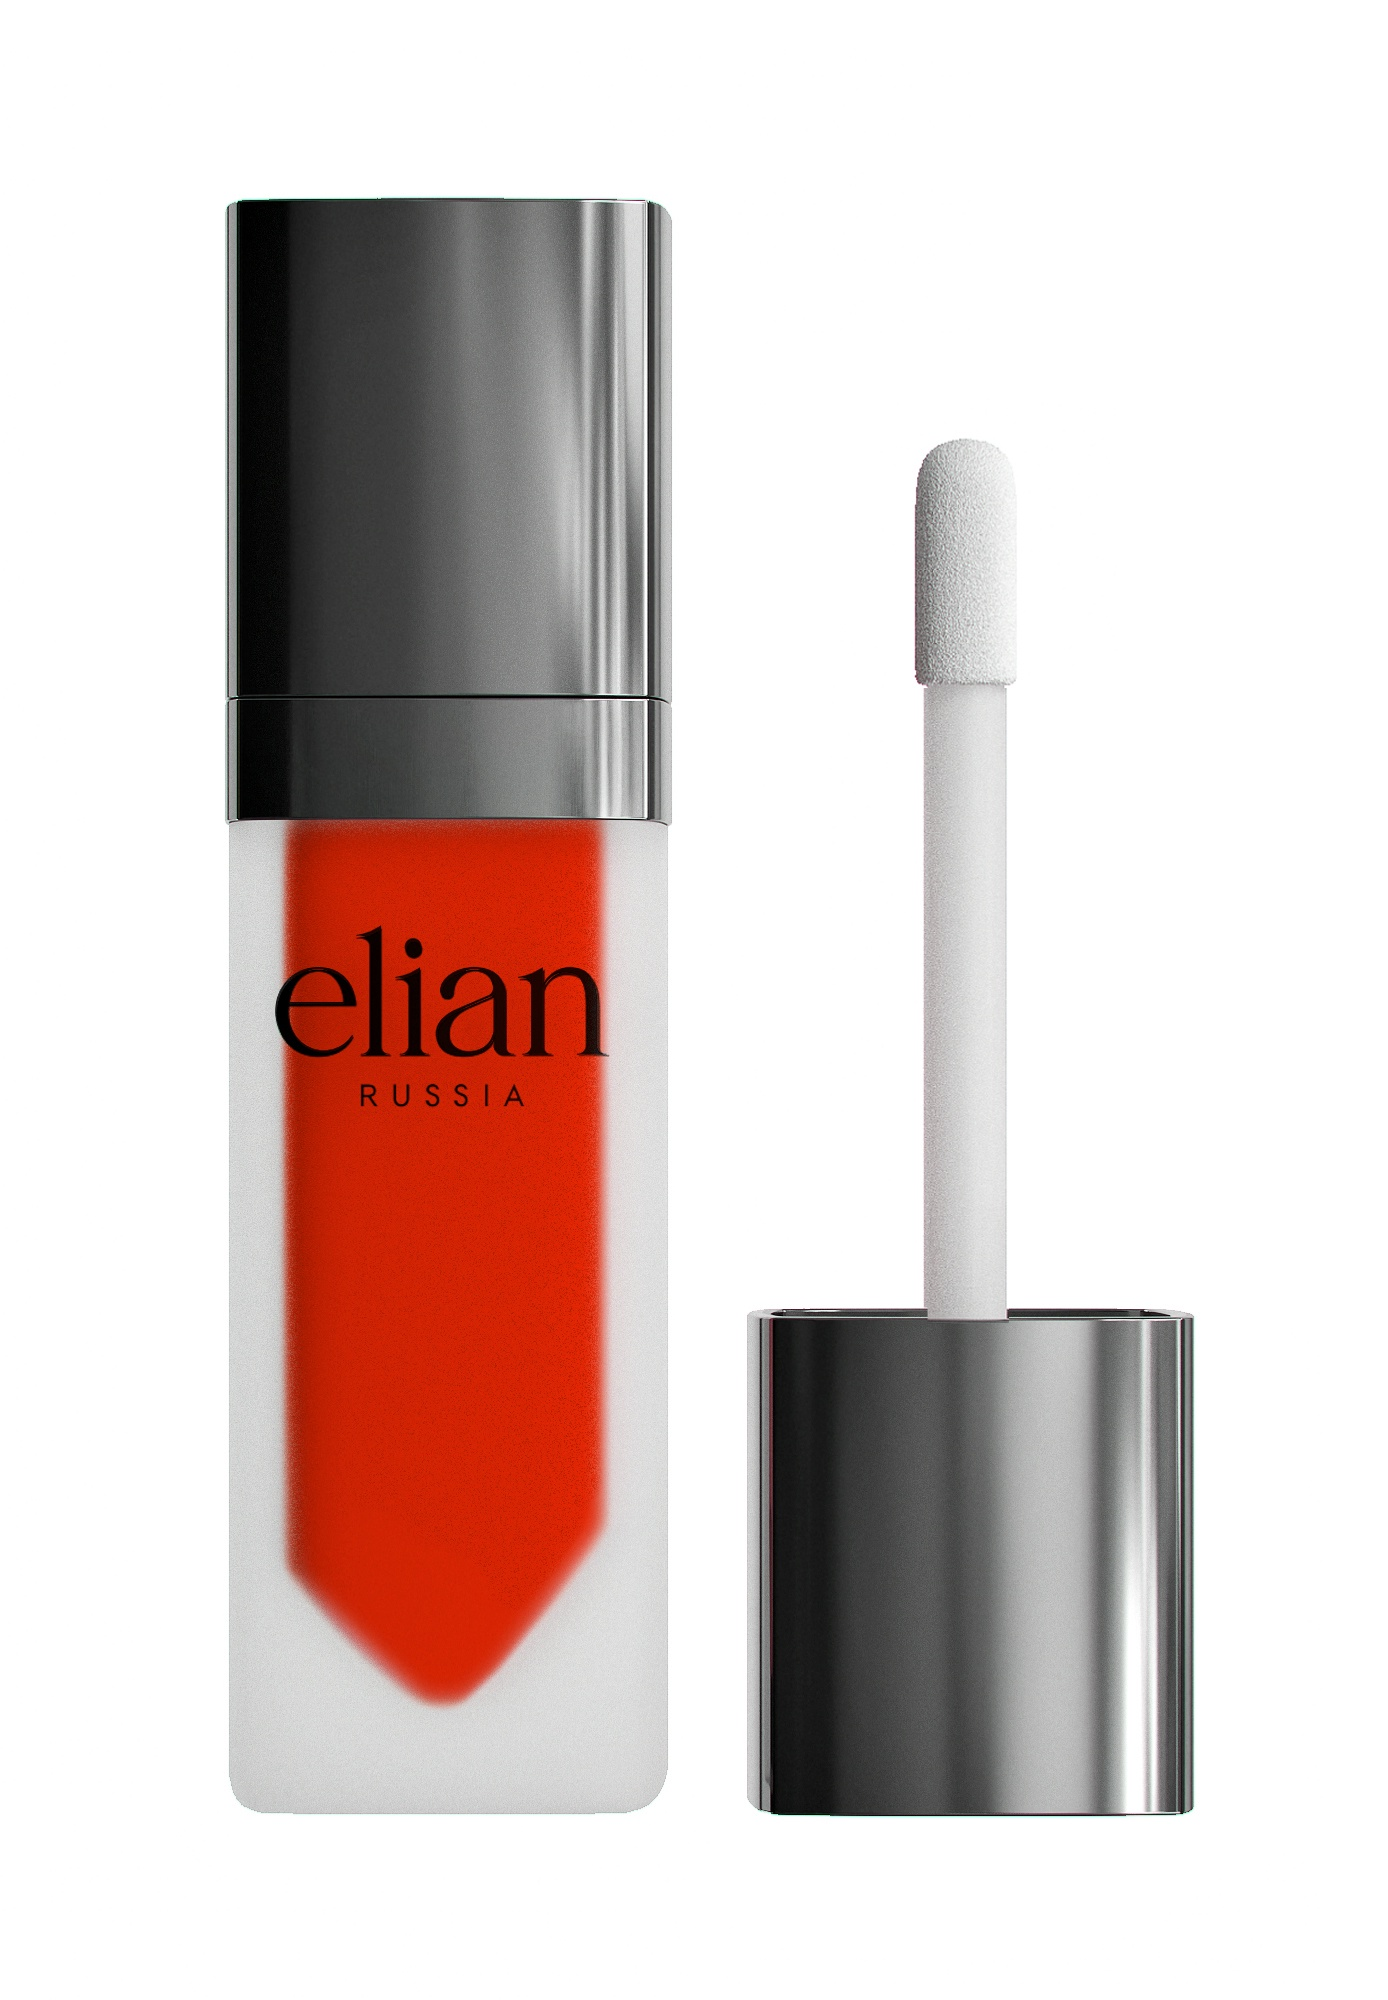 Жидкая матовая помада Superior matte liquid lipstick 606 Red and Peace ELIAN RUSSIA цена